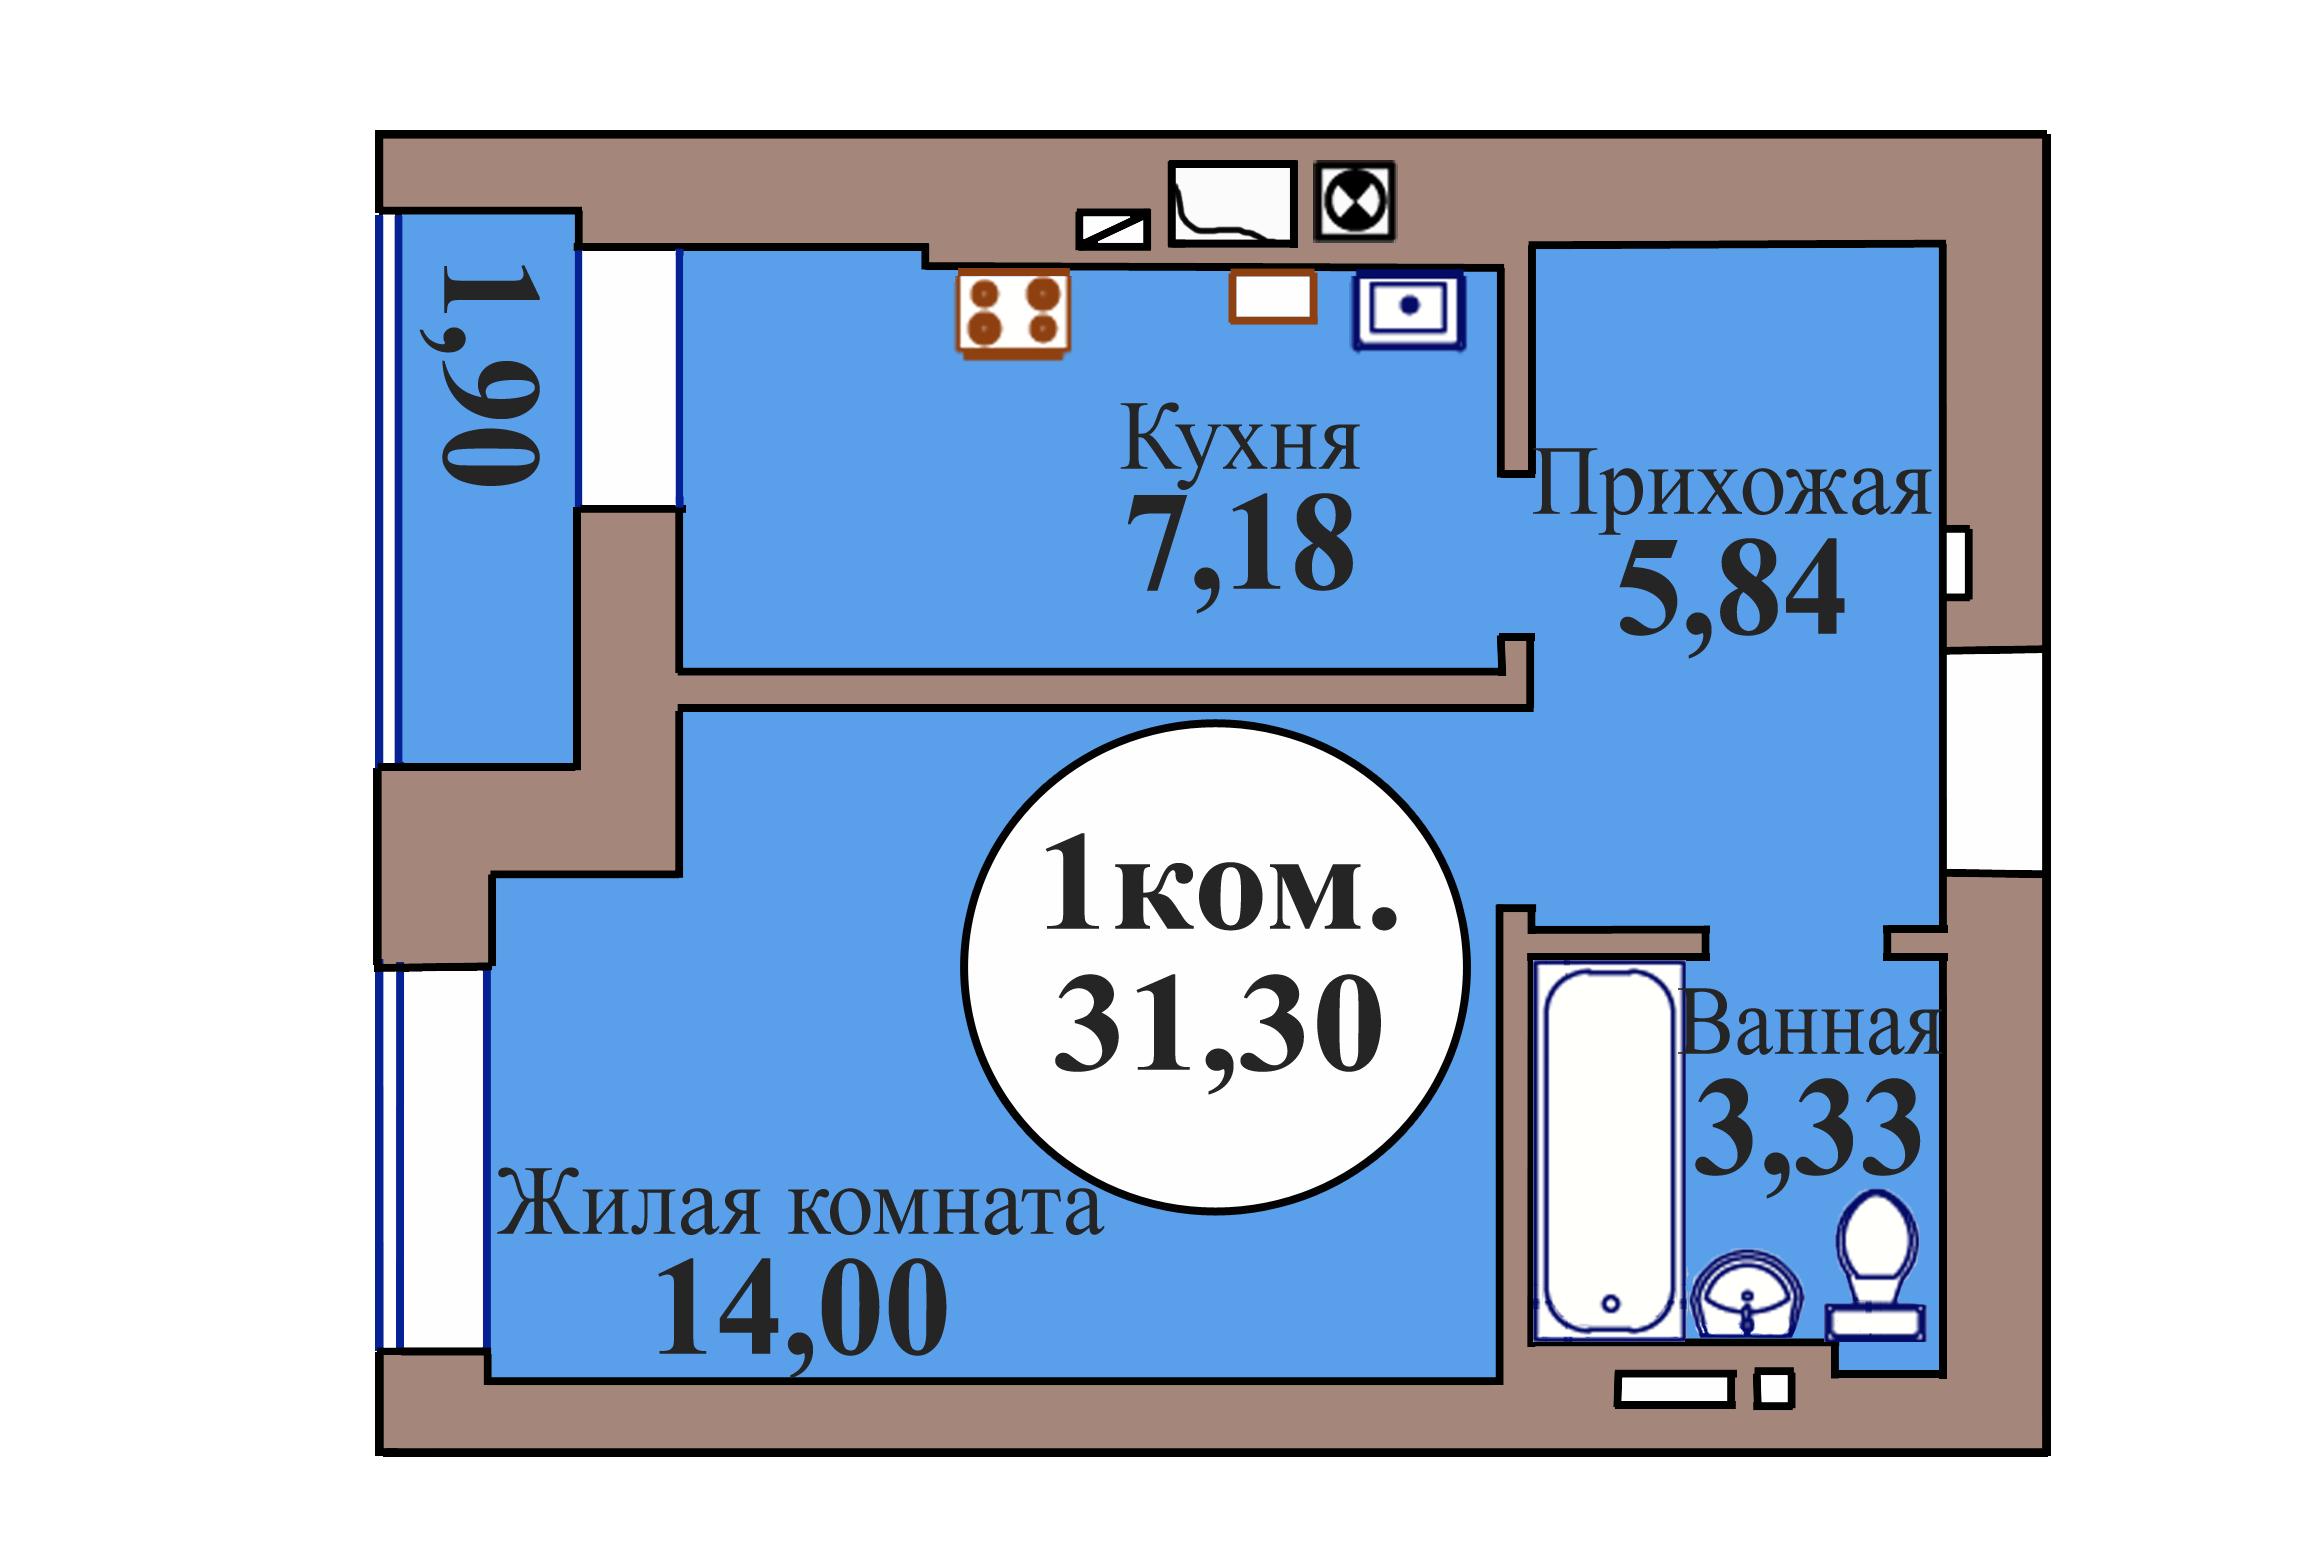 1-комн. кв. по ГП дом №3, МКР Васильково, кв. 36 в Калининграде